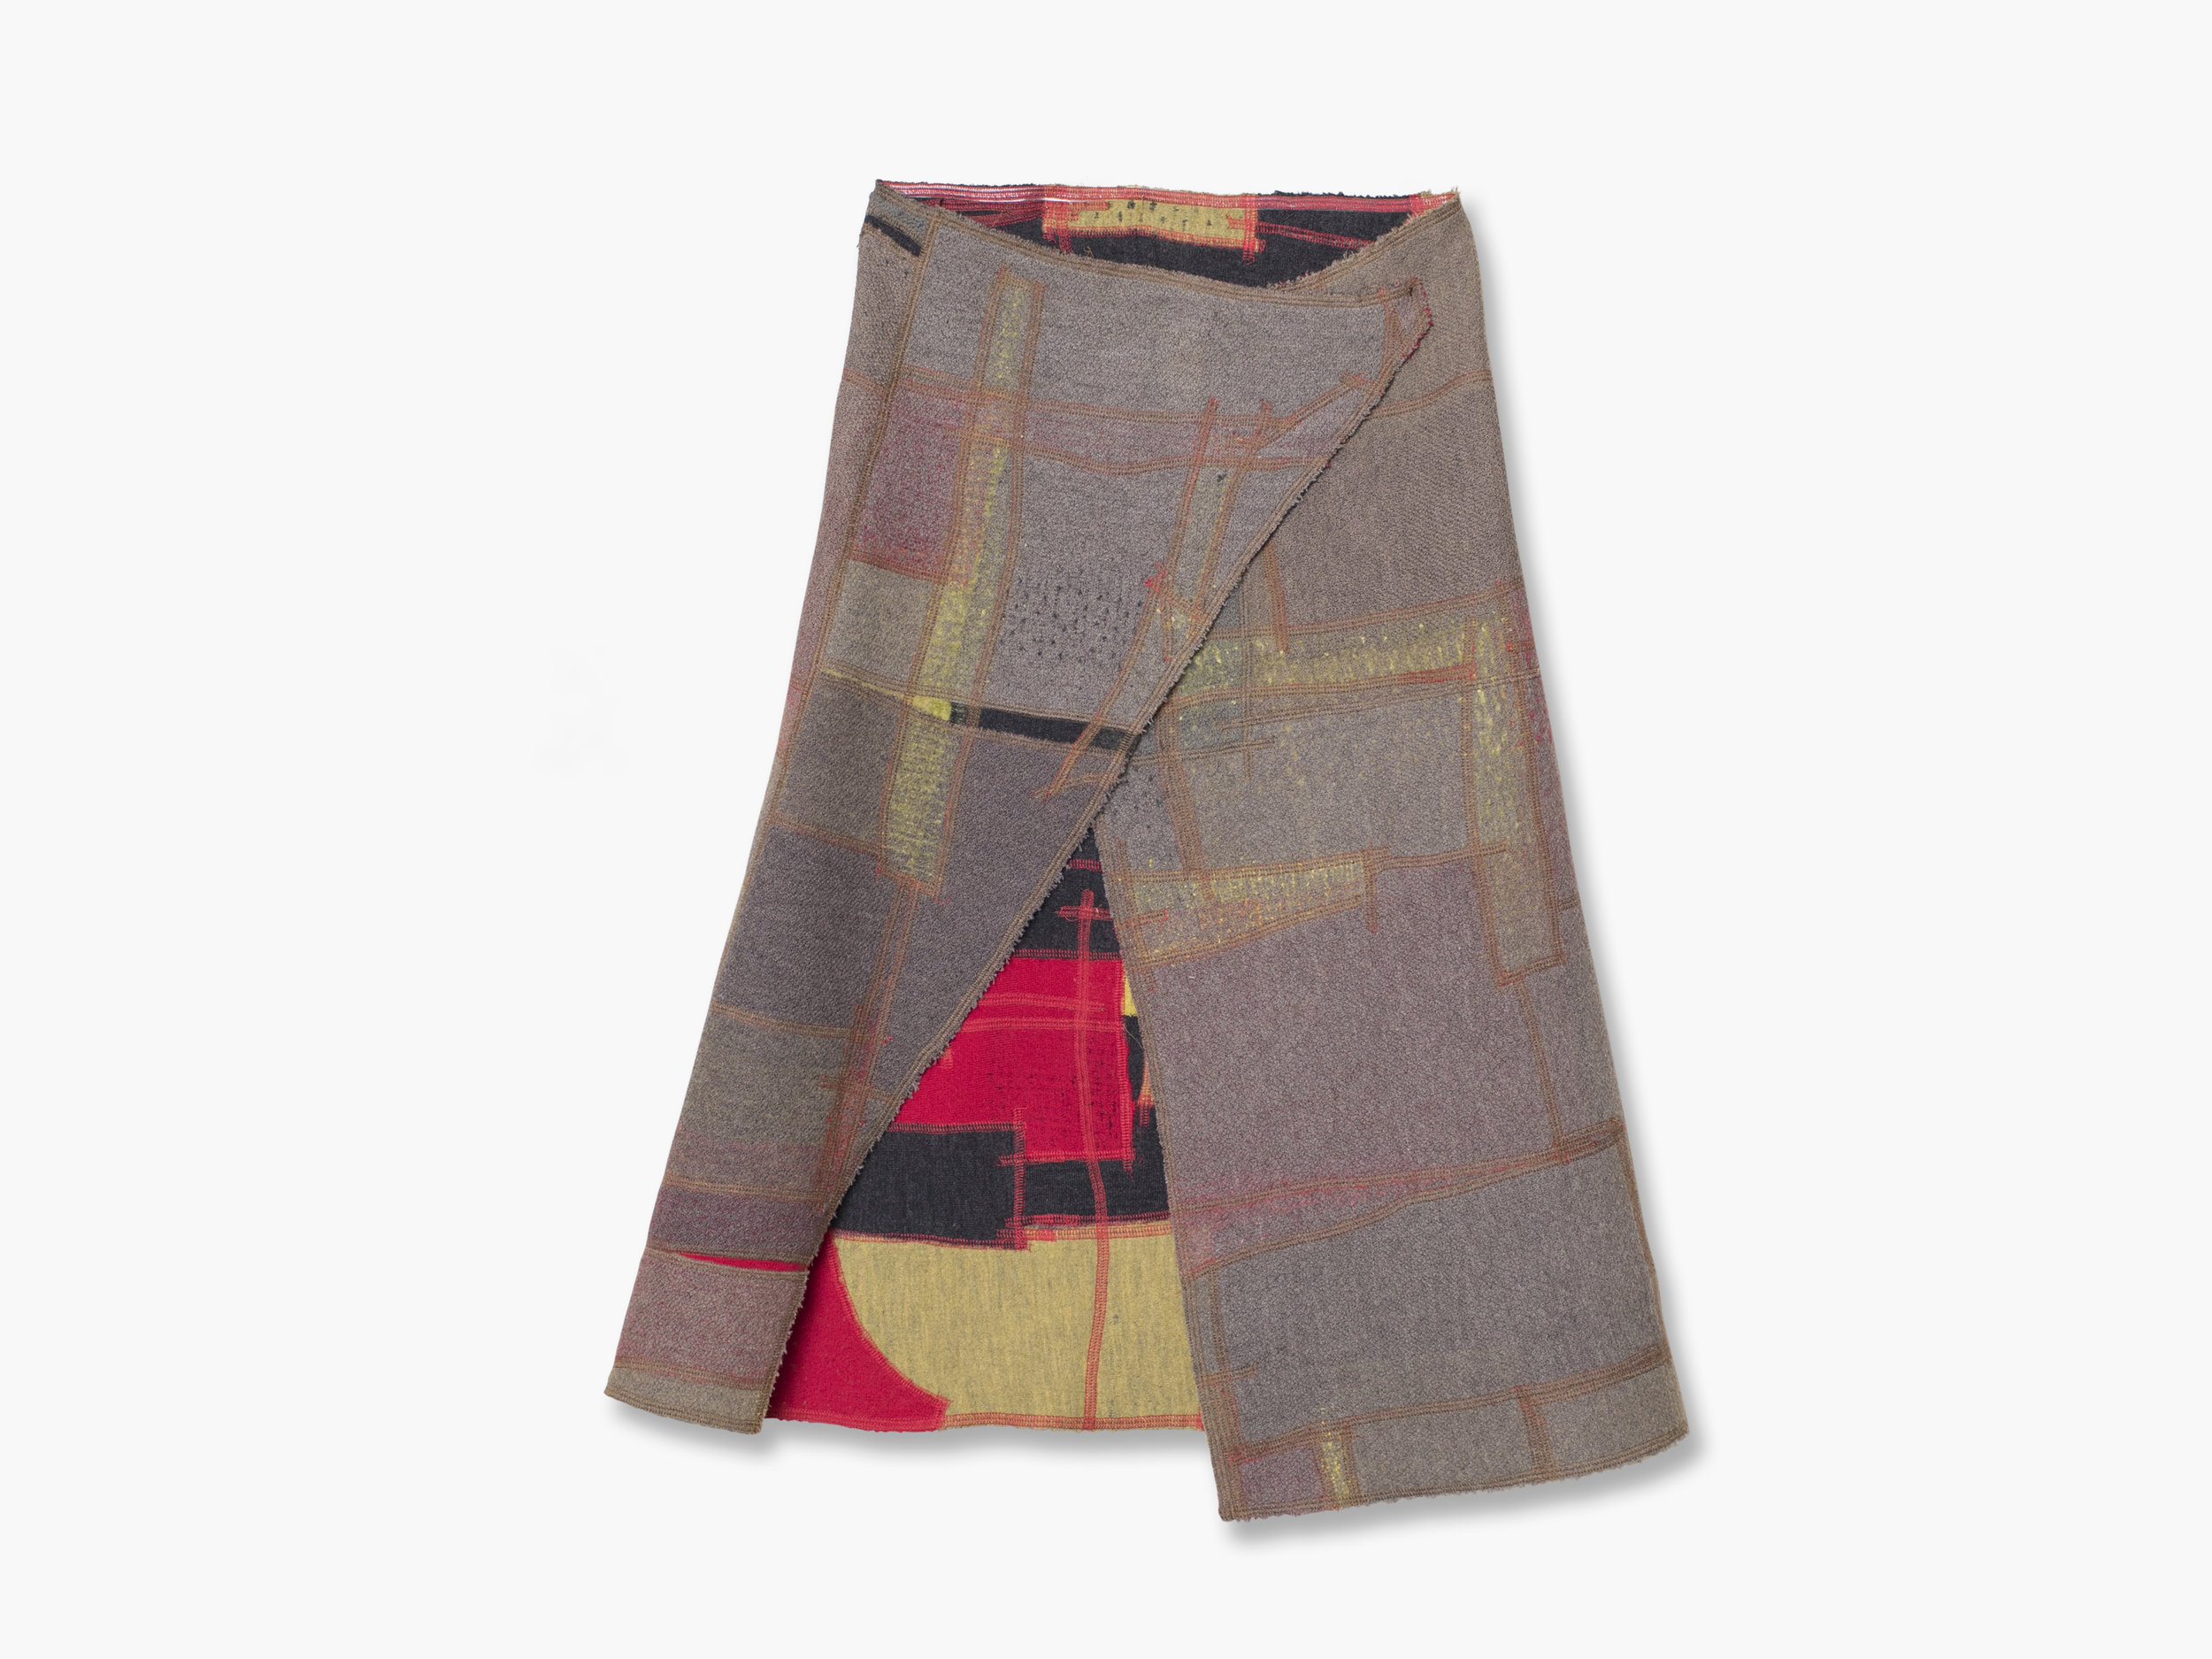 EF_Web_Lo_Garments_Skirt_1.jpg